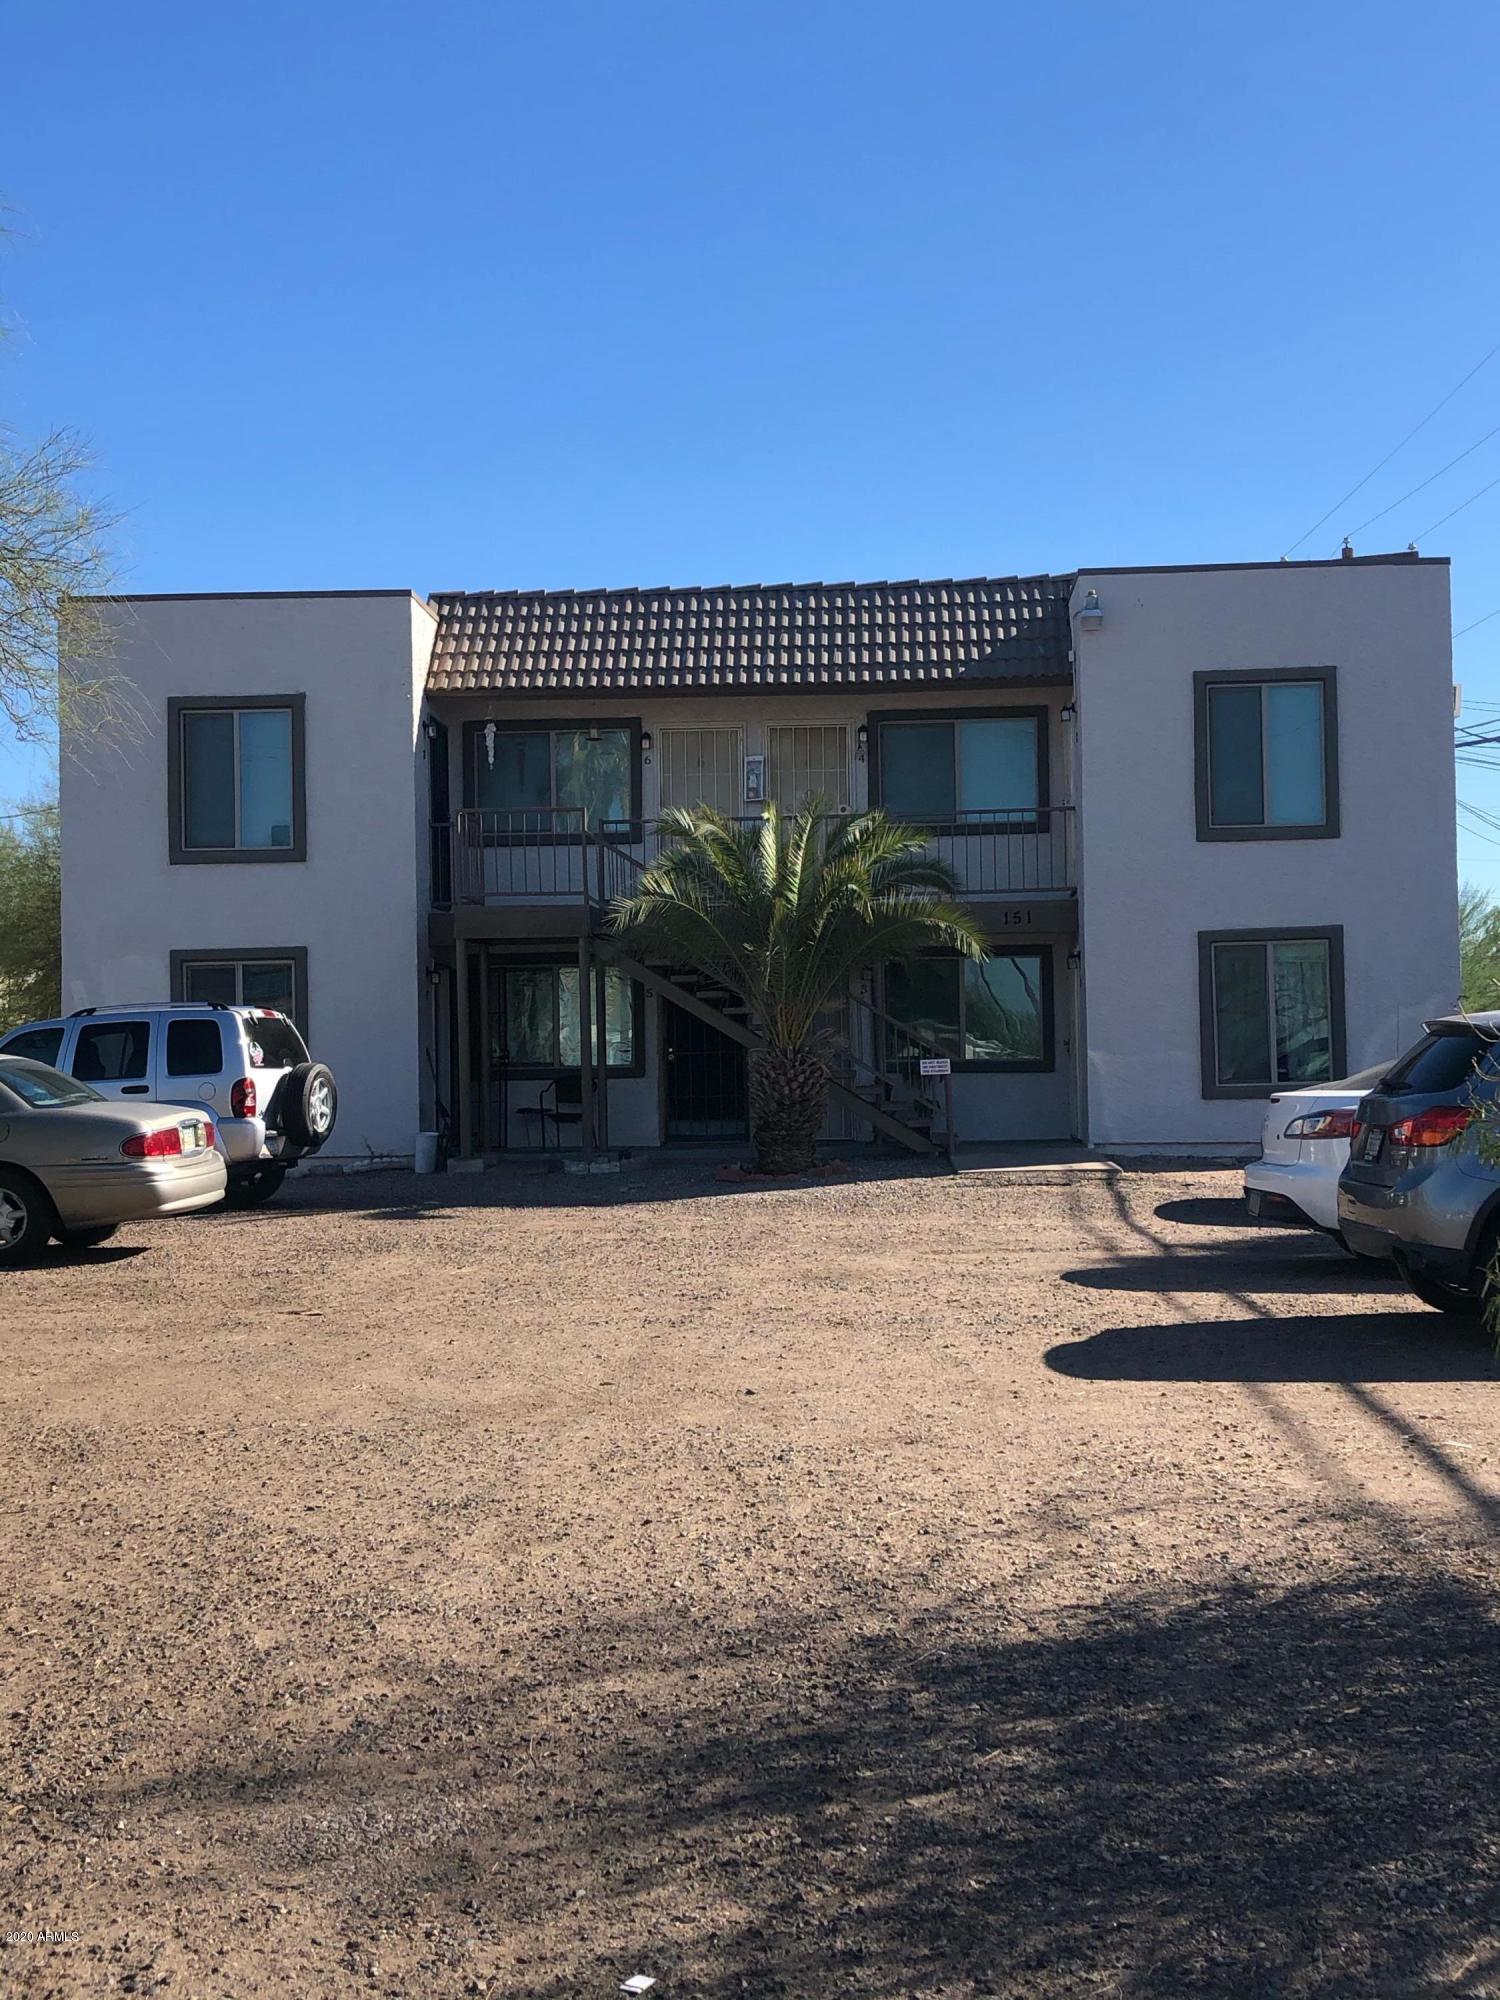 151 N PALO VERDE Drive, Apache Junction, Arizona 85120, ,Multifamily,For Sale,151 N PALO VERDE Drive,6158743